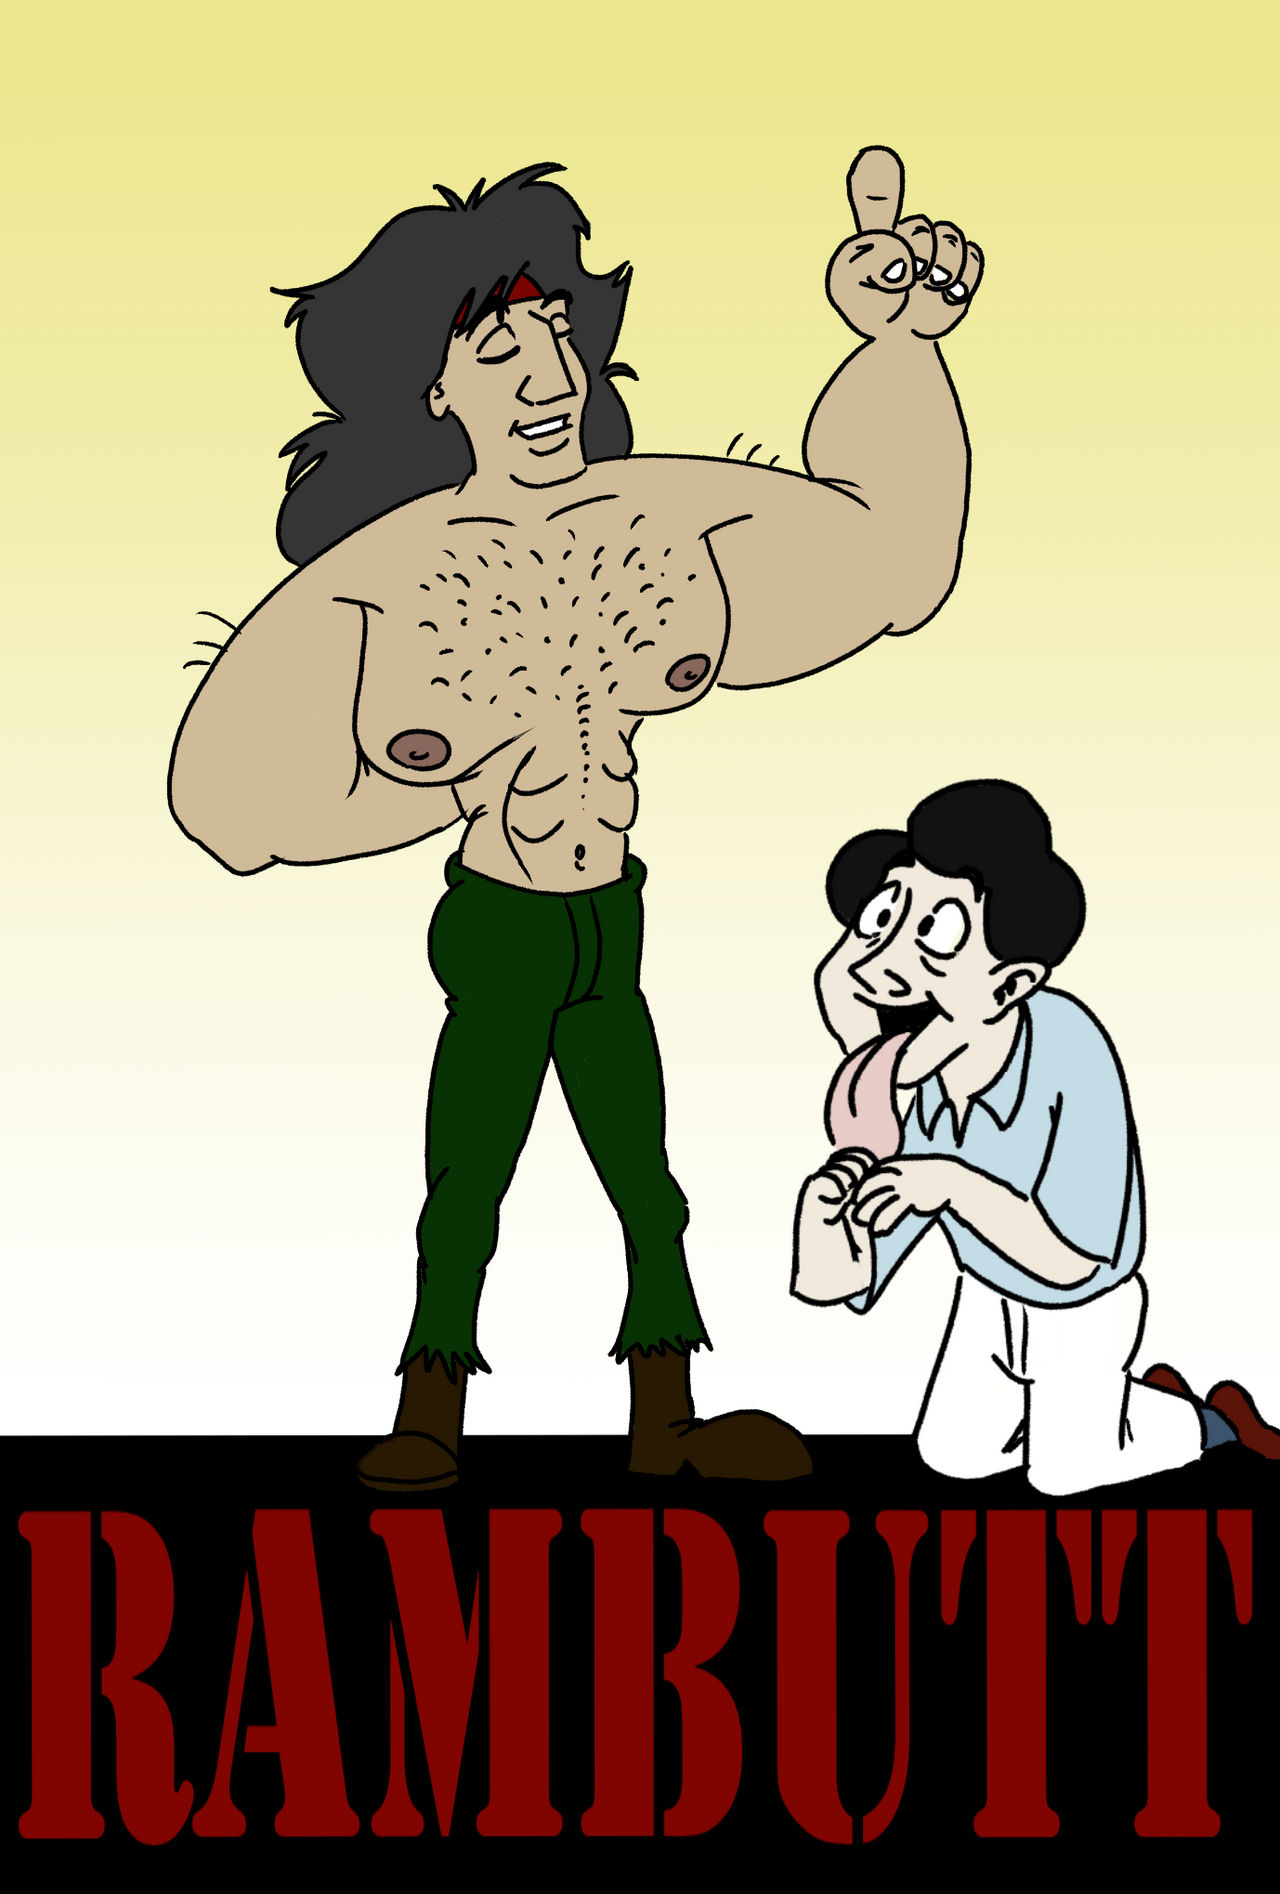 Rambutt starring Sylvester Stallone and Rock Hudso